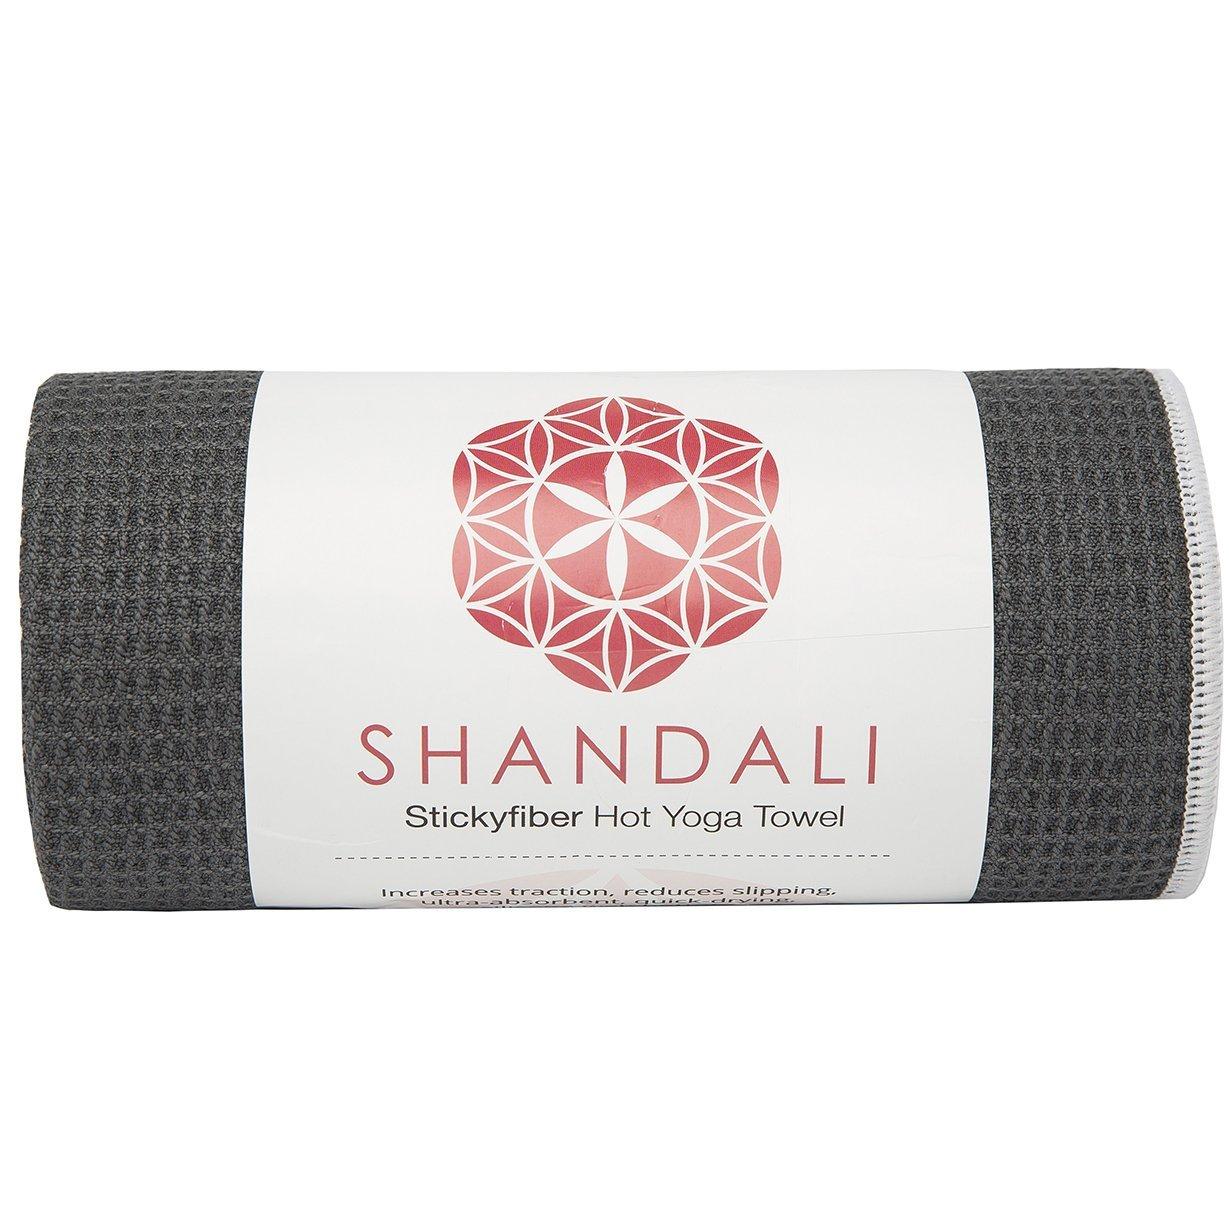 Shandali Stickyfiber Hot Yoga Towel Review